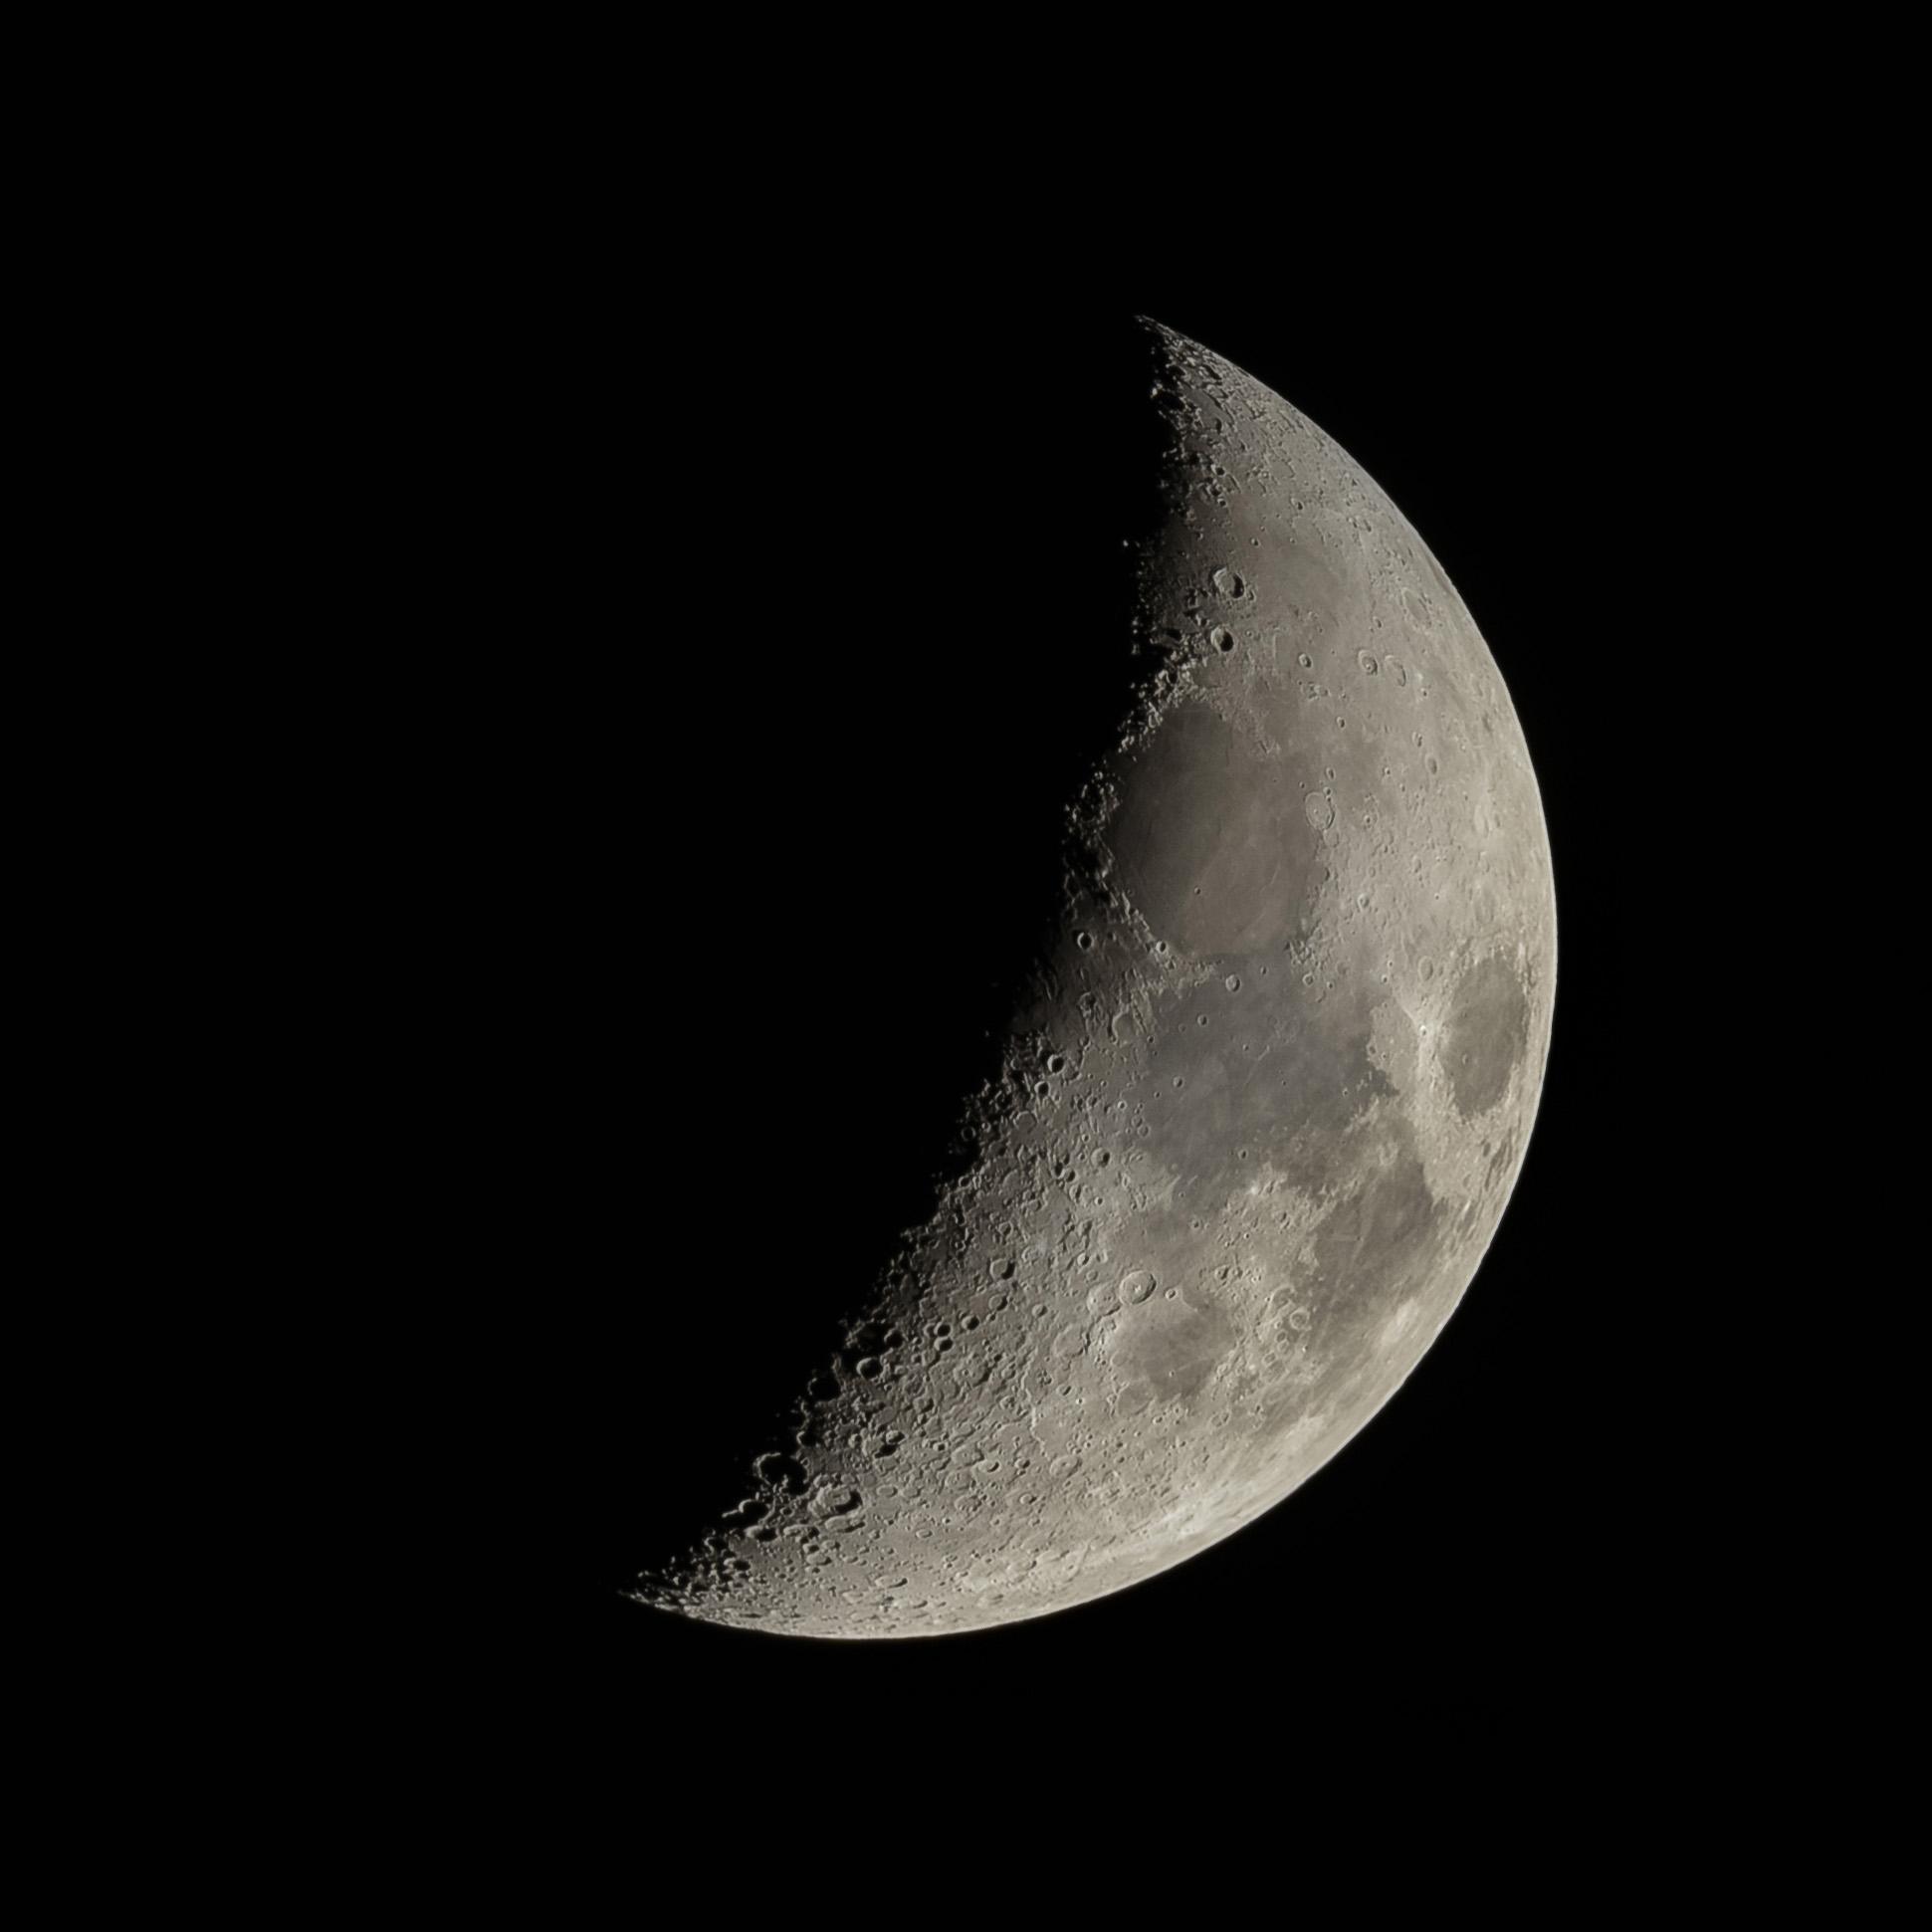 Moon 47pct